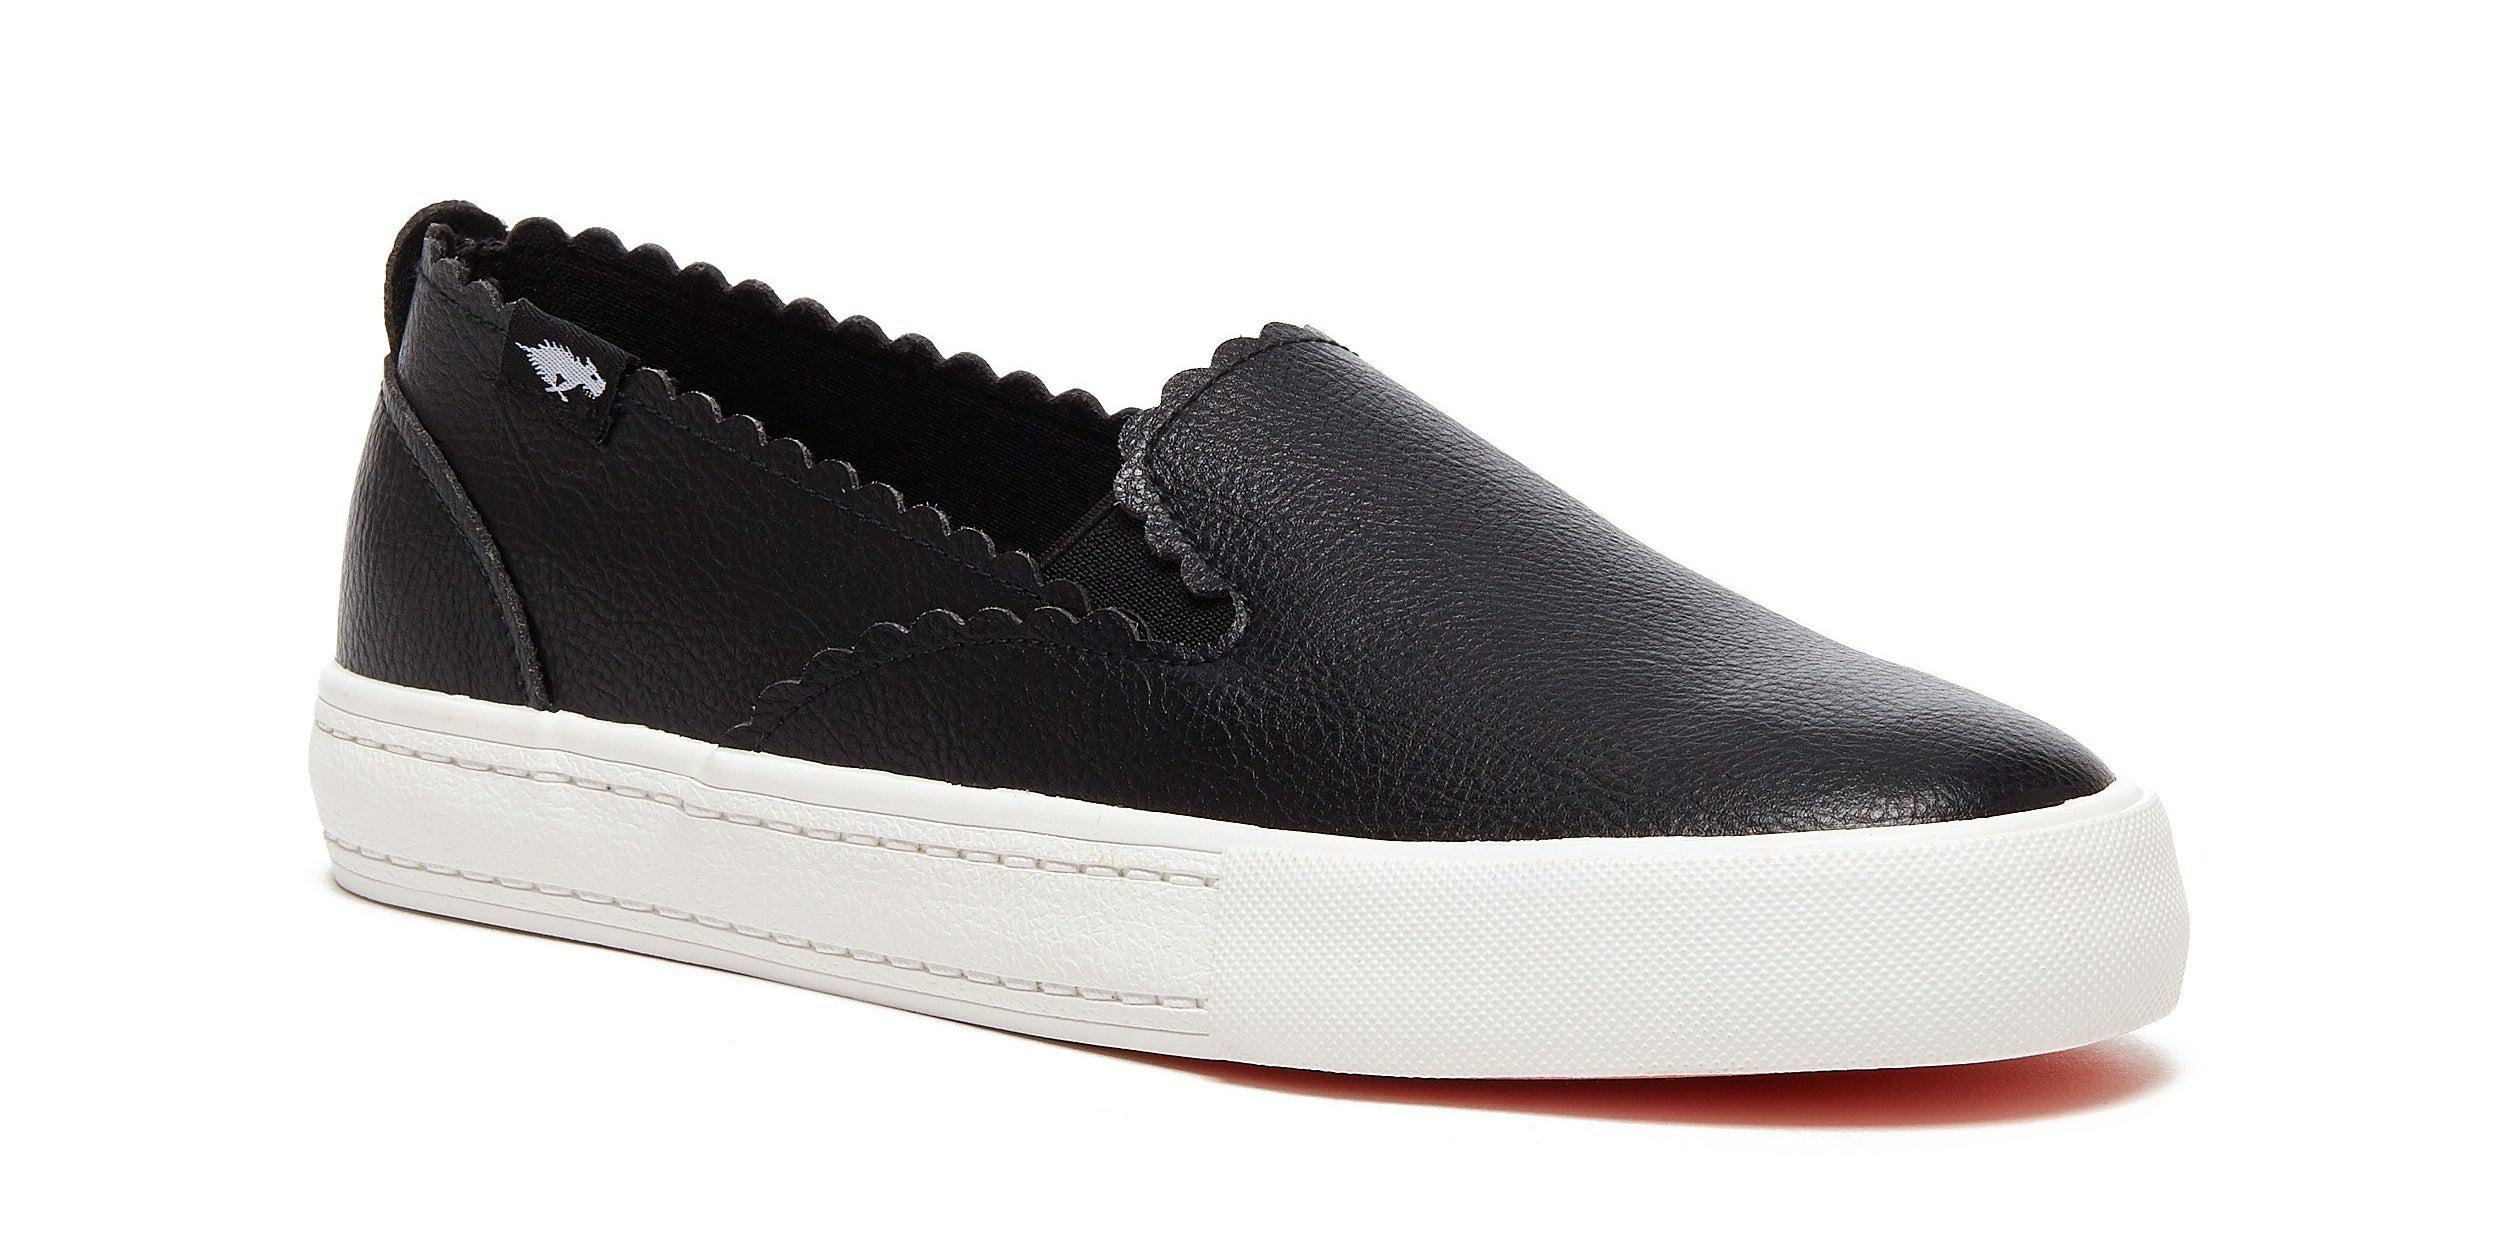 The sneakers in black